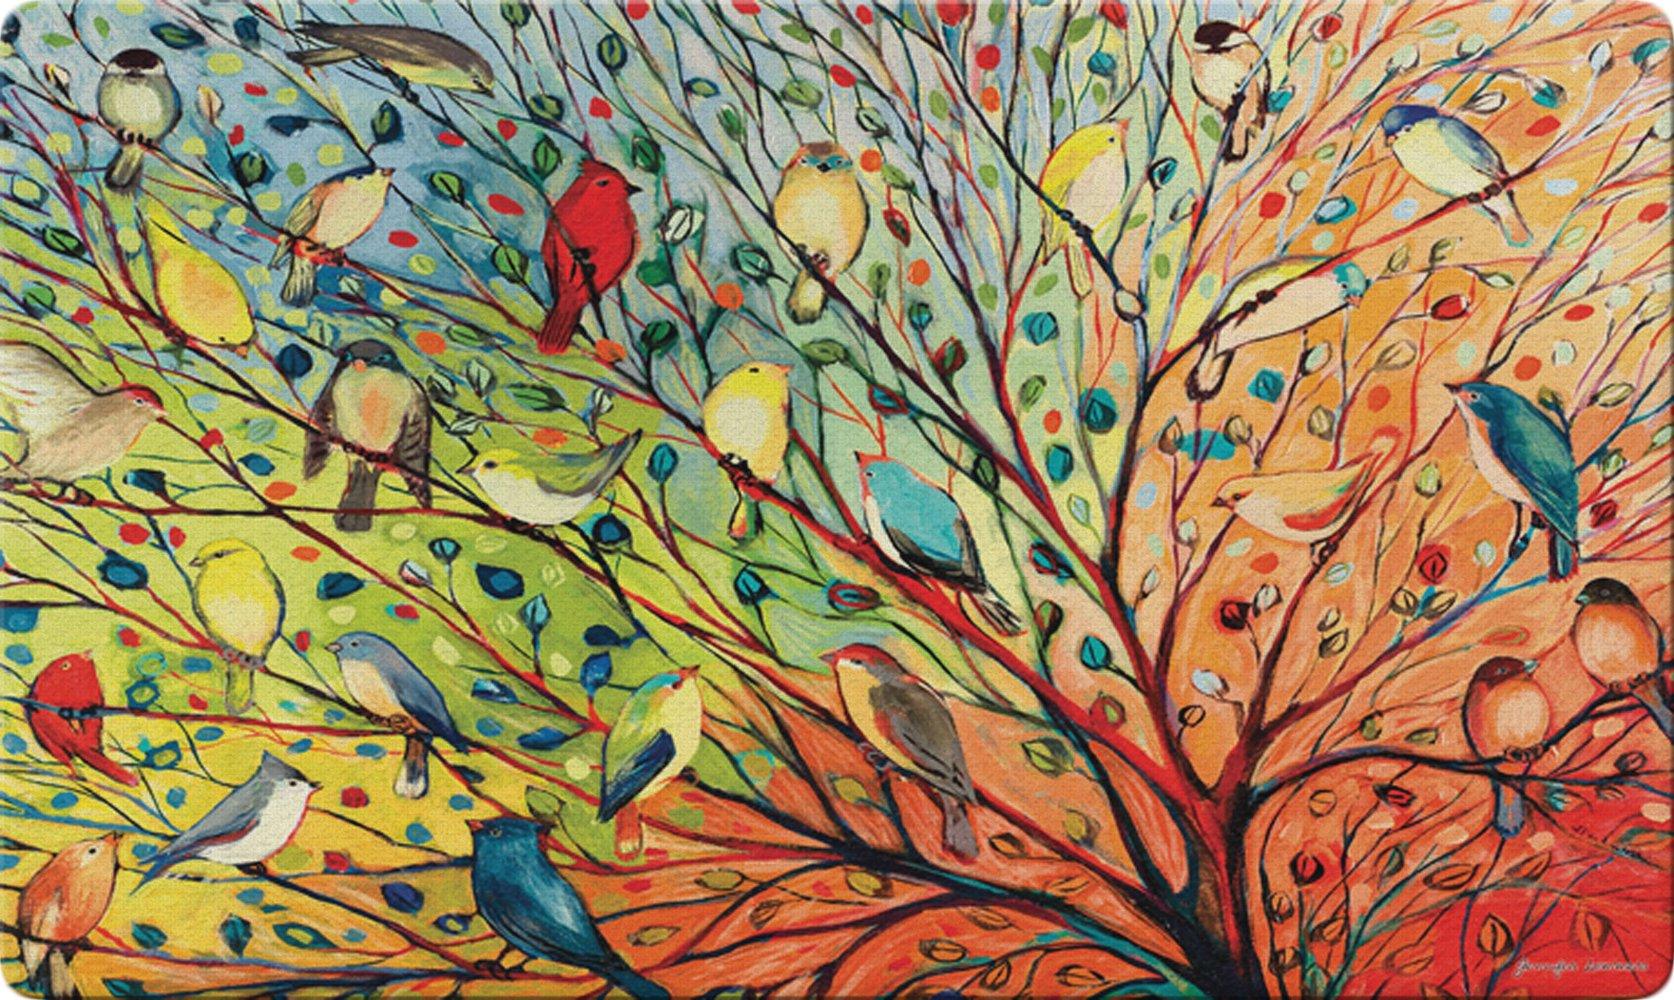 Toland Home Garden Tree Birds 18 x 30 Inch Decorative Floor Mat Colorful Bird Branch Collage Doormat